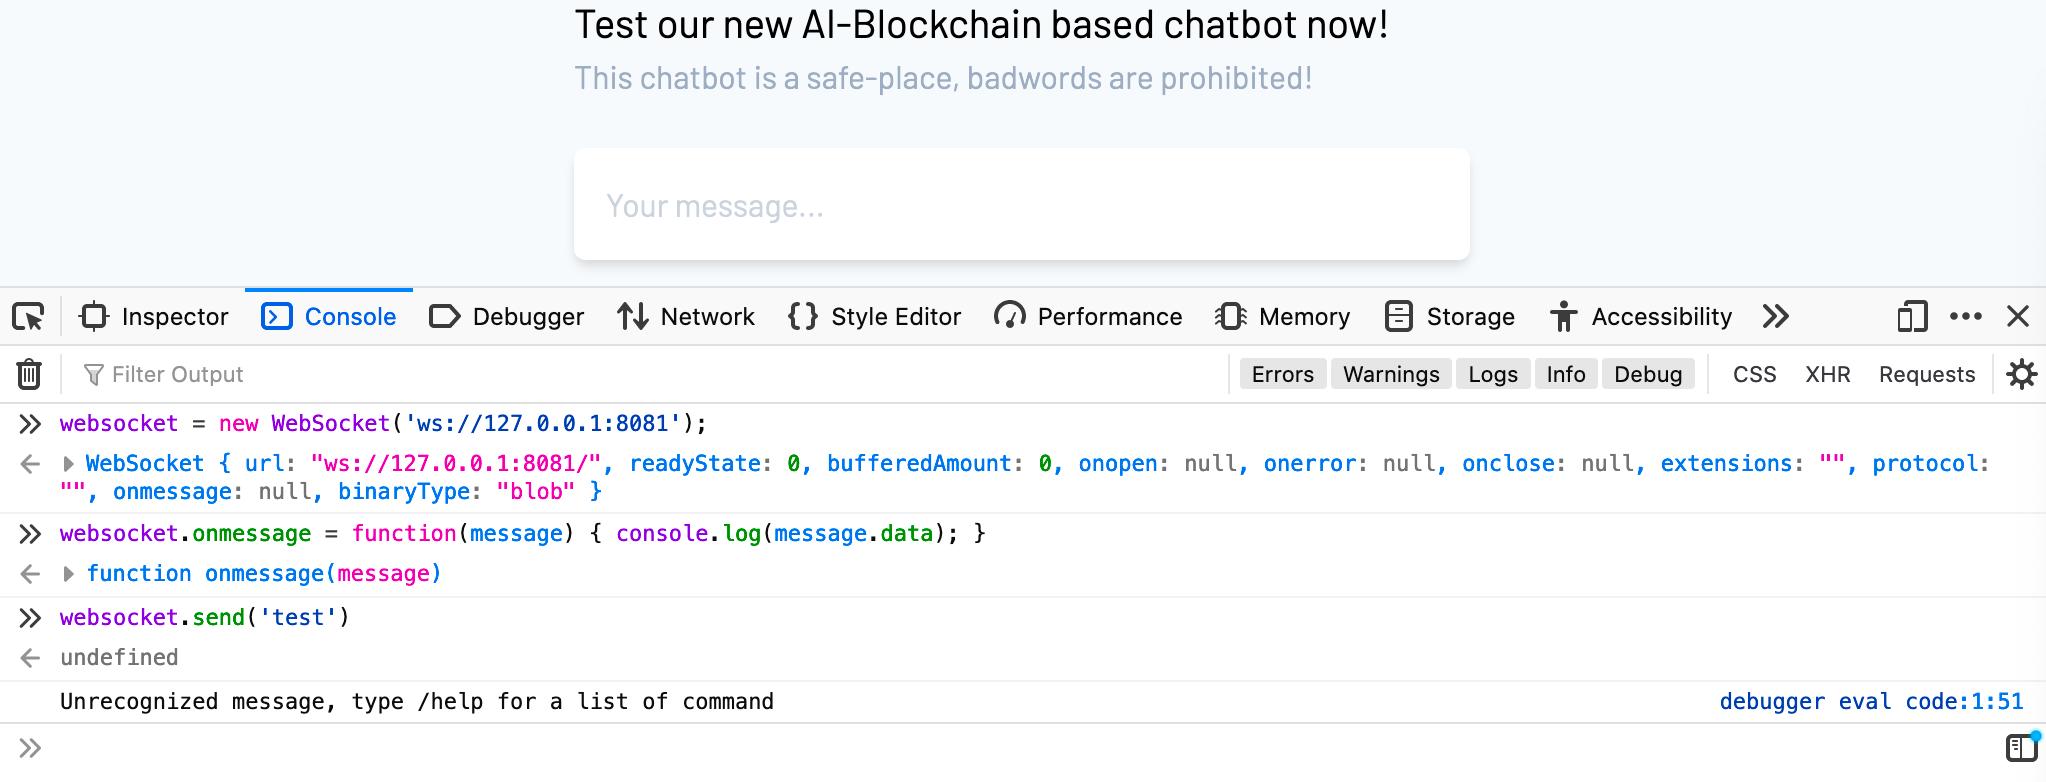 misc ctf websocket chatbot connexion